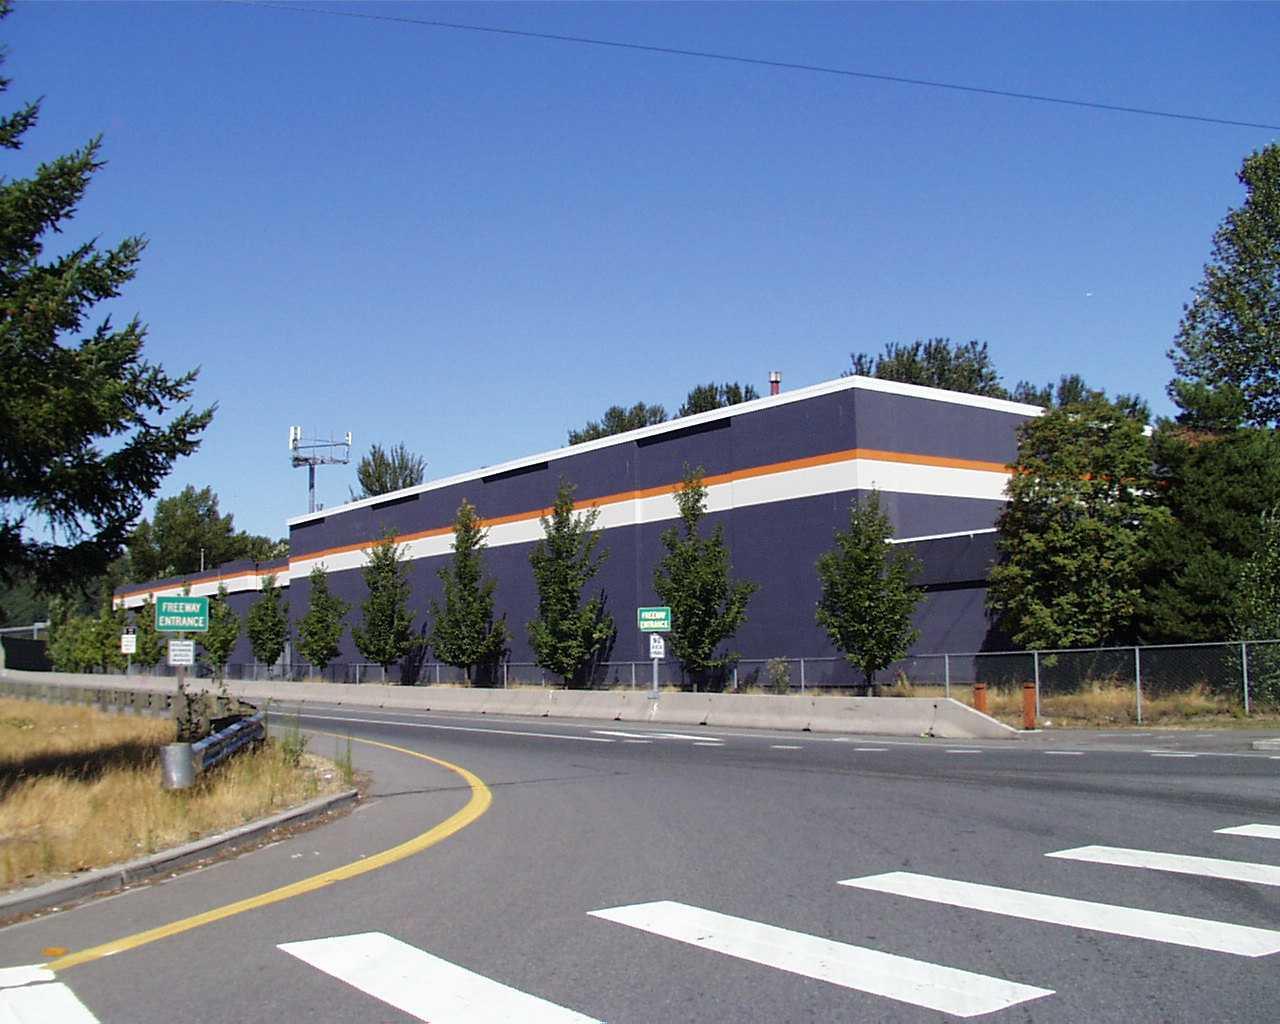 Interurban I-5 Building